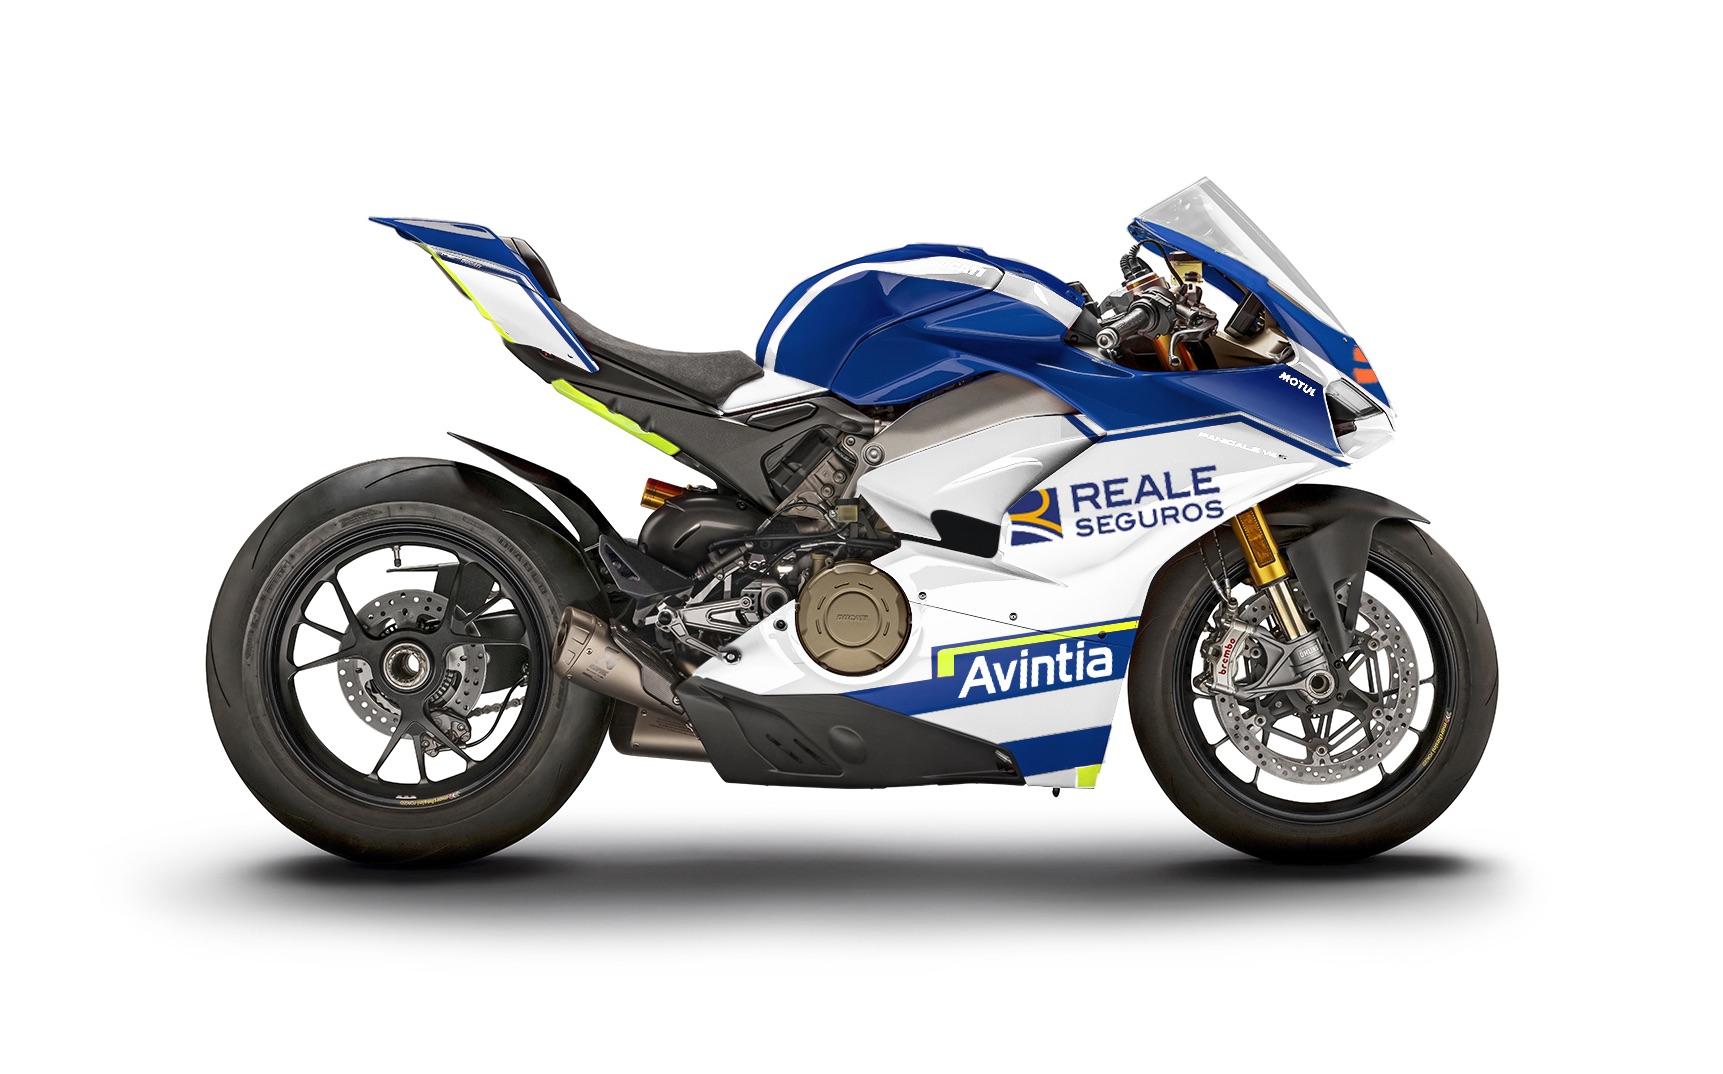 Ducati V4 Panigale Avintia